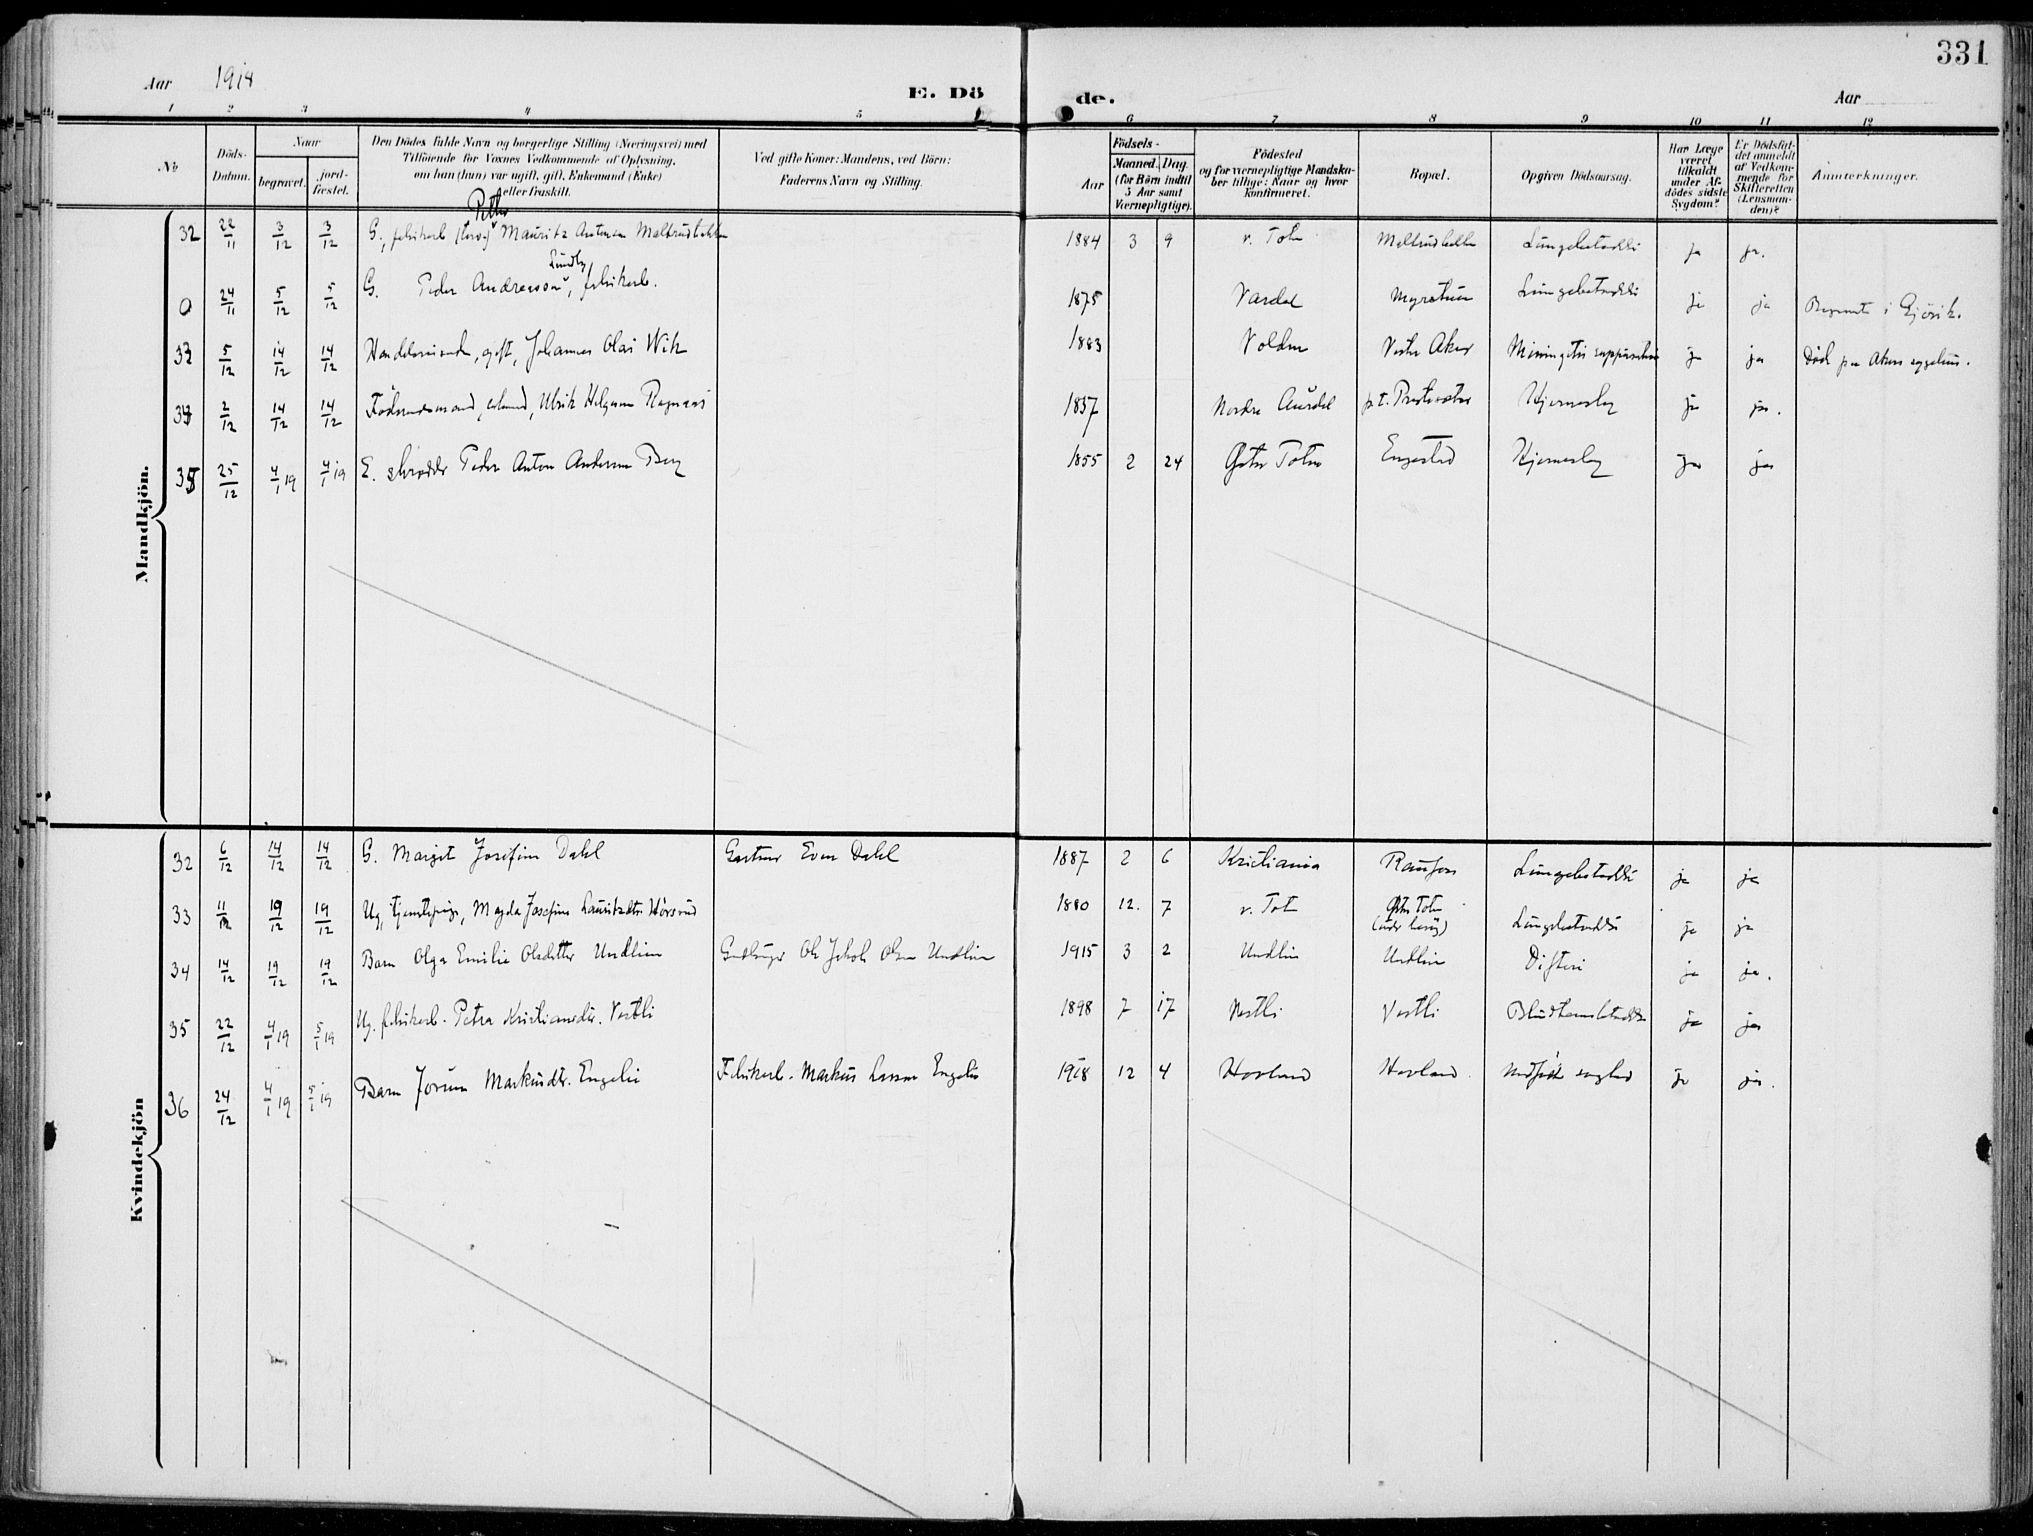 SAH, Vestre Toten prestekontor, H/Ha/Haa/L0014: Ministerialbok nr. 14, 1907-1920, s. 331